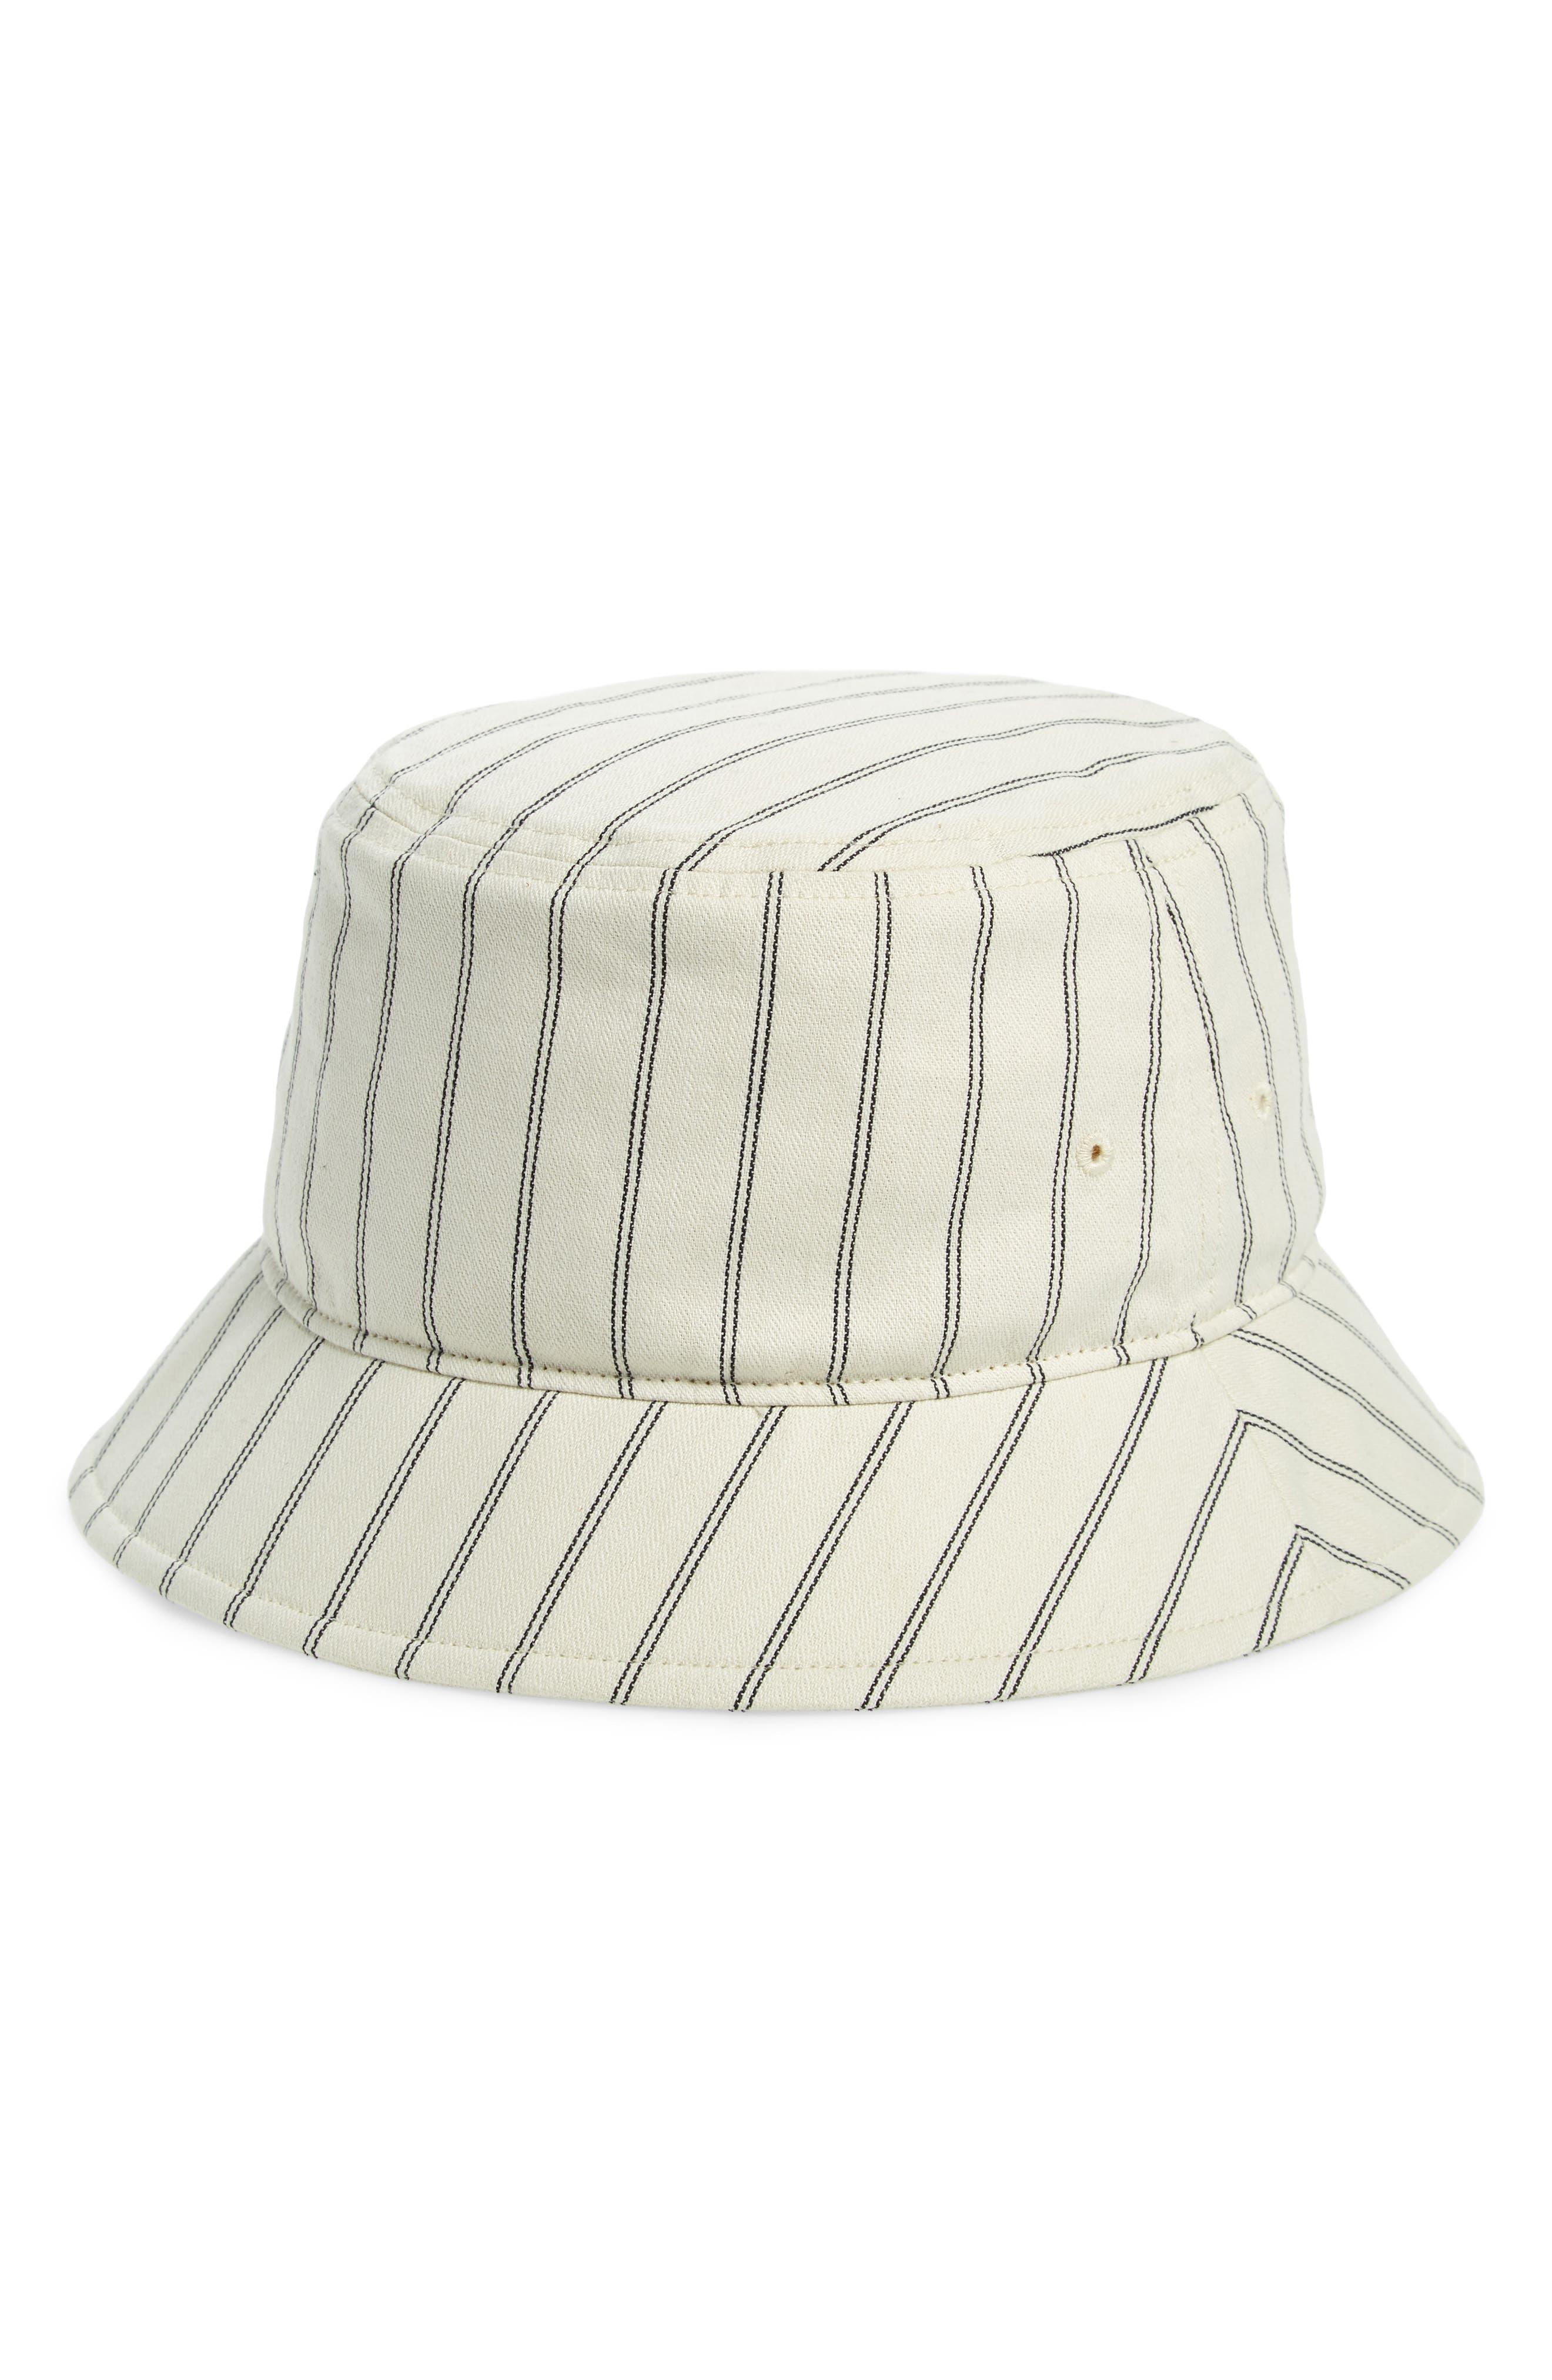 RAG & BONE Ellis Bucket Hat, Main, color, IVORY STRIPE